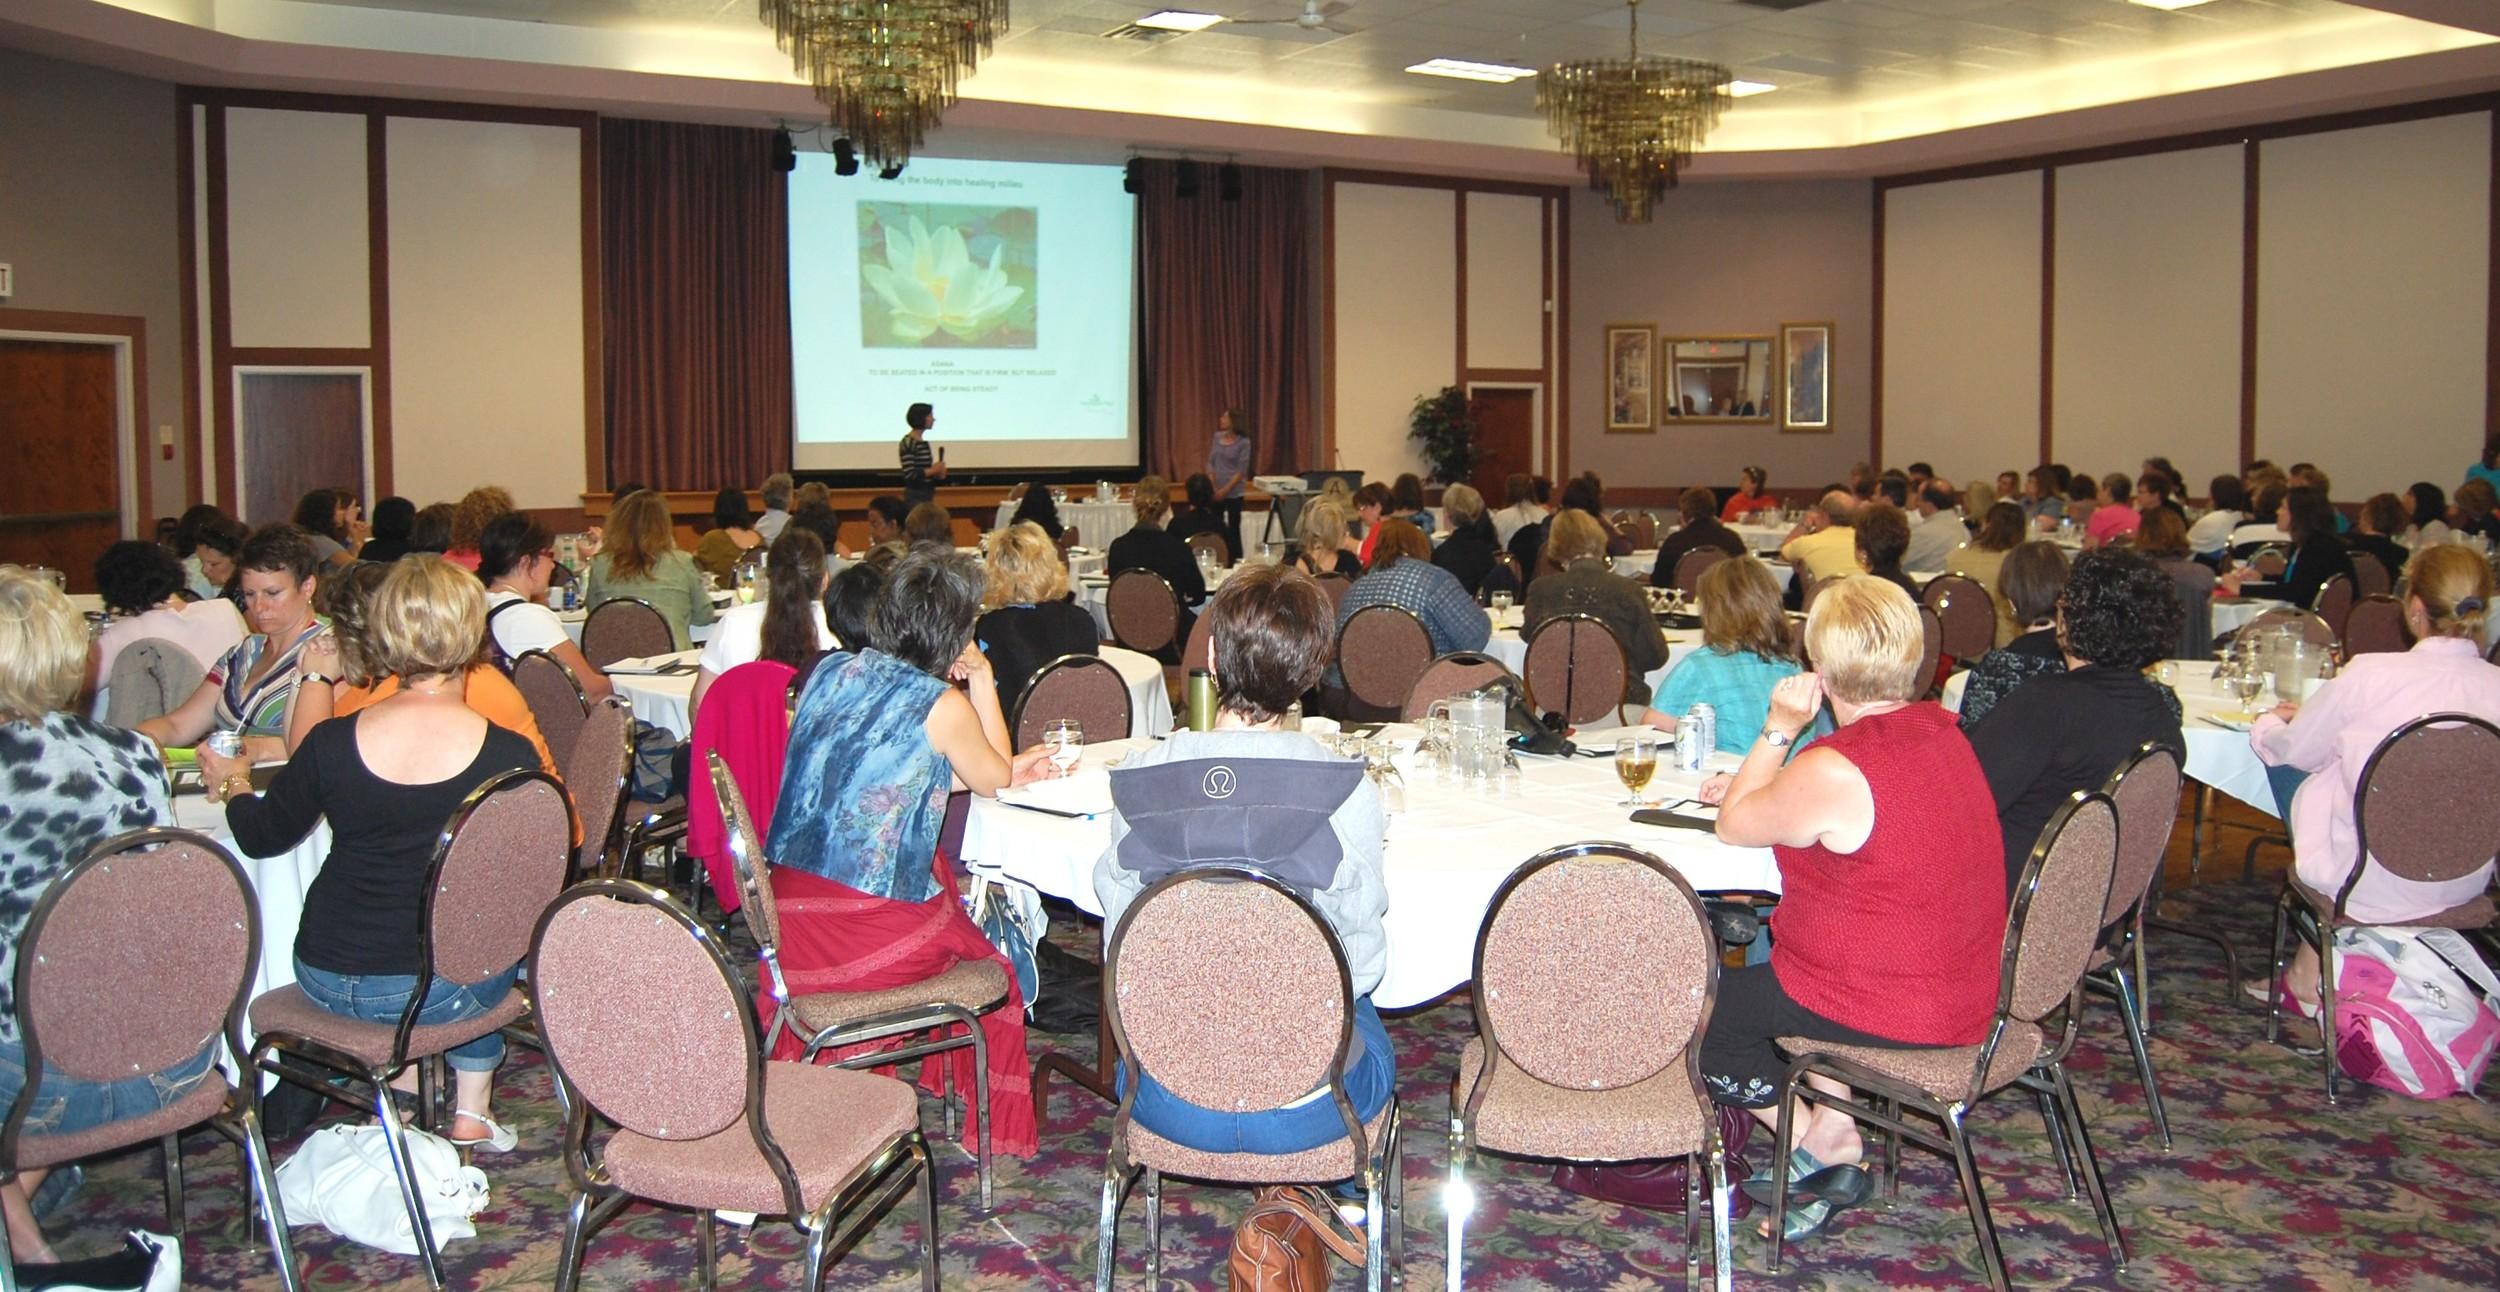 Compassion Fatigue Conference in Toronto 2011